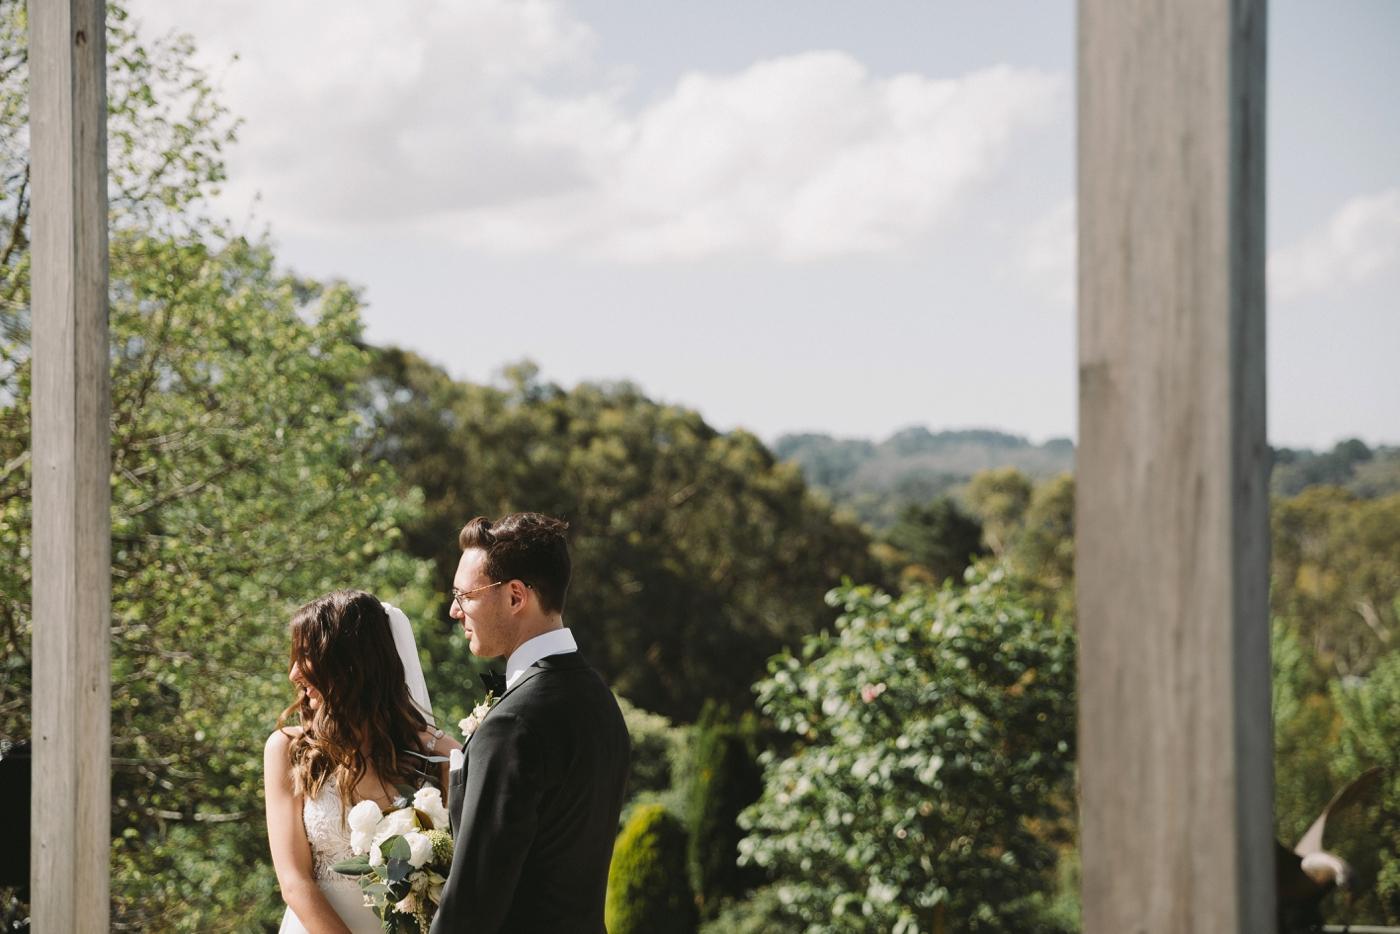 Katie and Ben - Natural Wedding Photography in Adelaide - Beautiful, Candid Wedding Photographer - Adelaide Hills Wedding - Katherine Schultz - www.katherineschultzphotography.com_0031.jpg